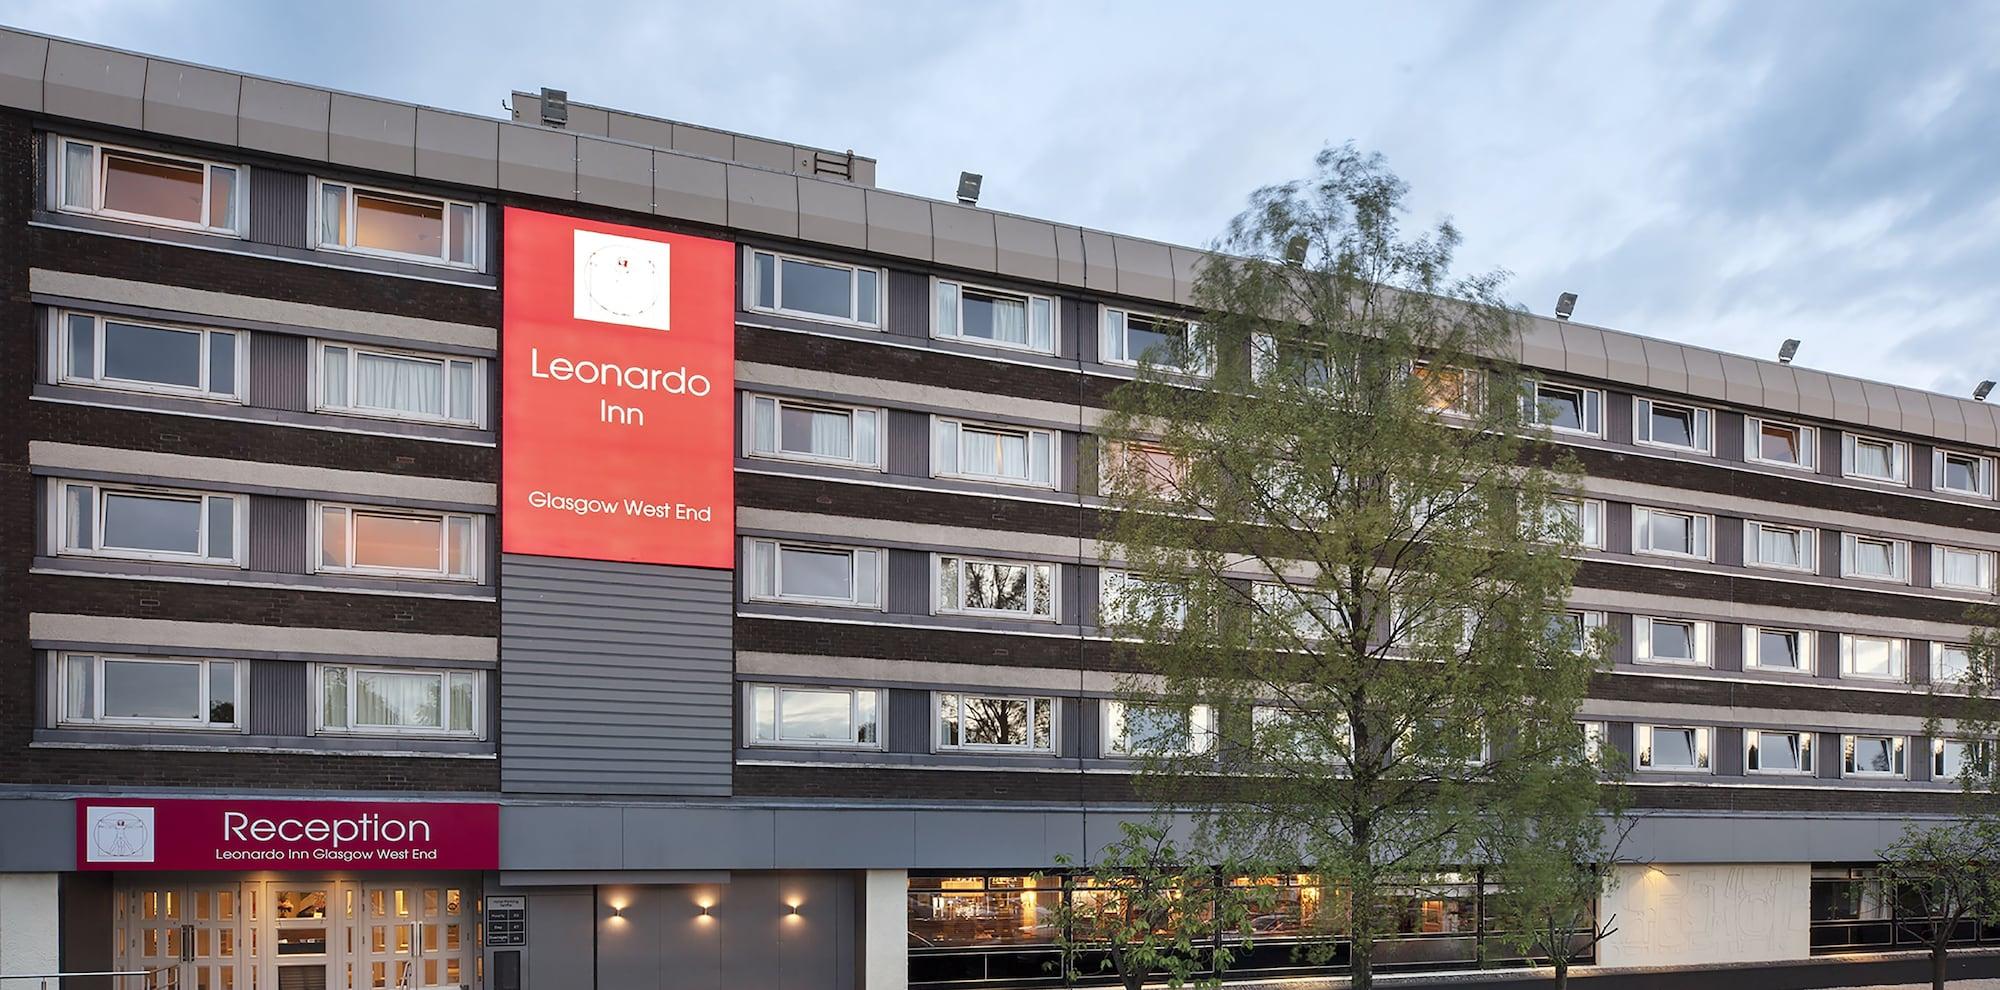 Leonardo Inn Hotel Glasgow West End, Glasgow